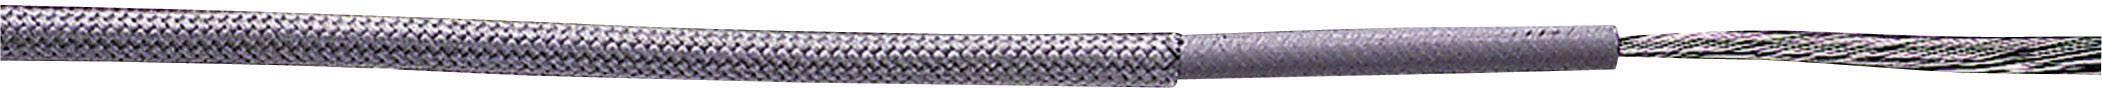 Vykurovací kábel LappKabel 0065104 ÖLFLEX® HEAT 180 SIF, 1 x 1 mm², vonkajší Ø 3 mm, metrový tovar, priehľadná